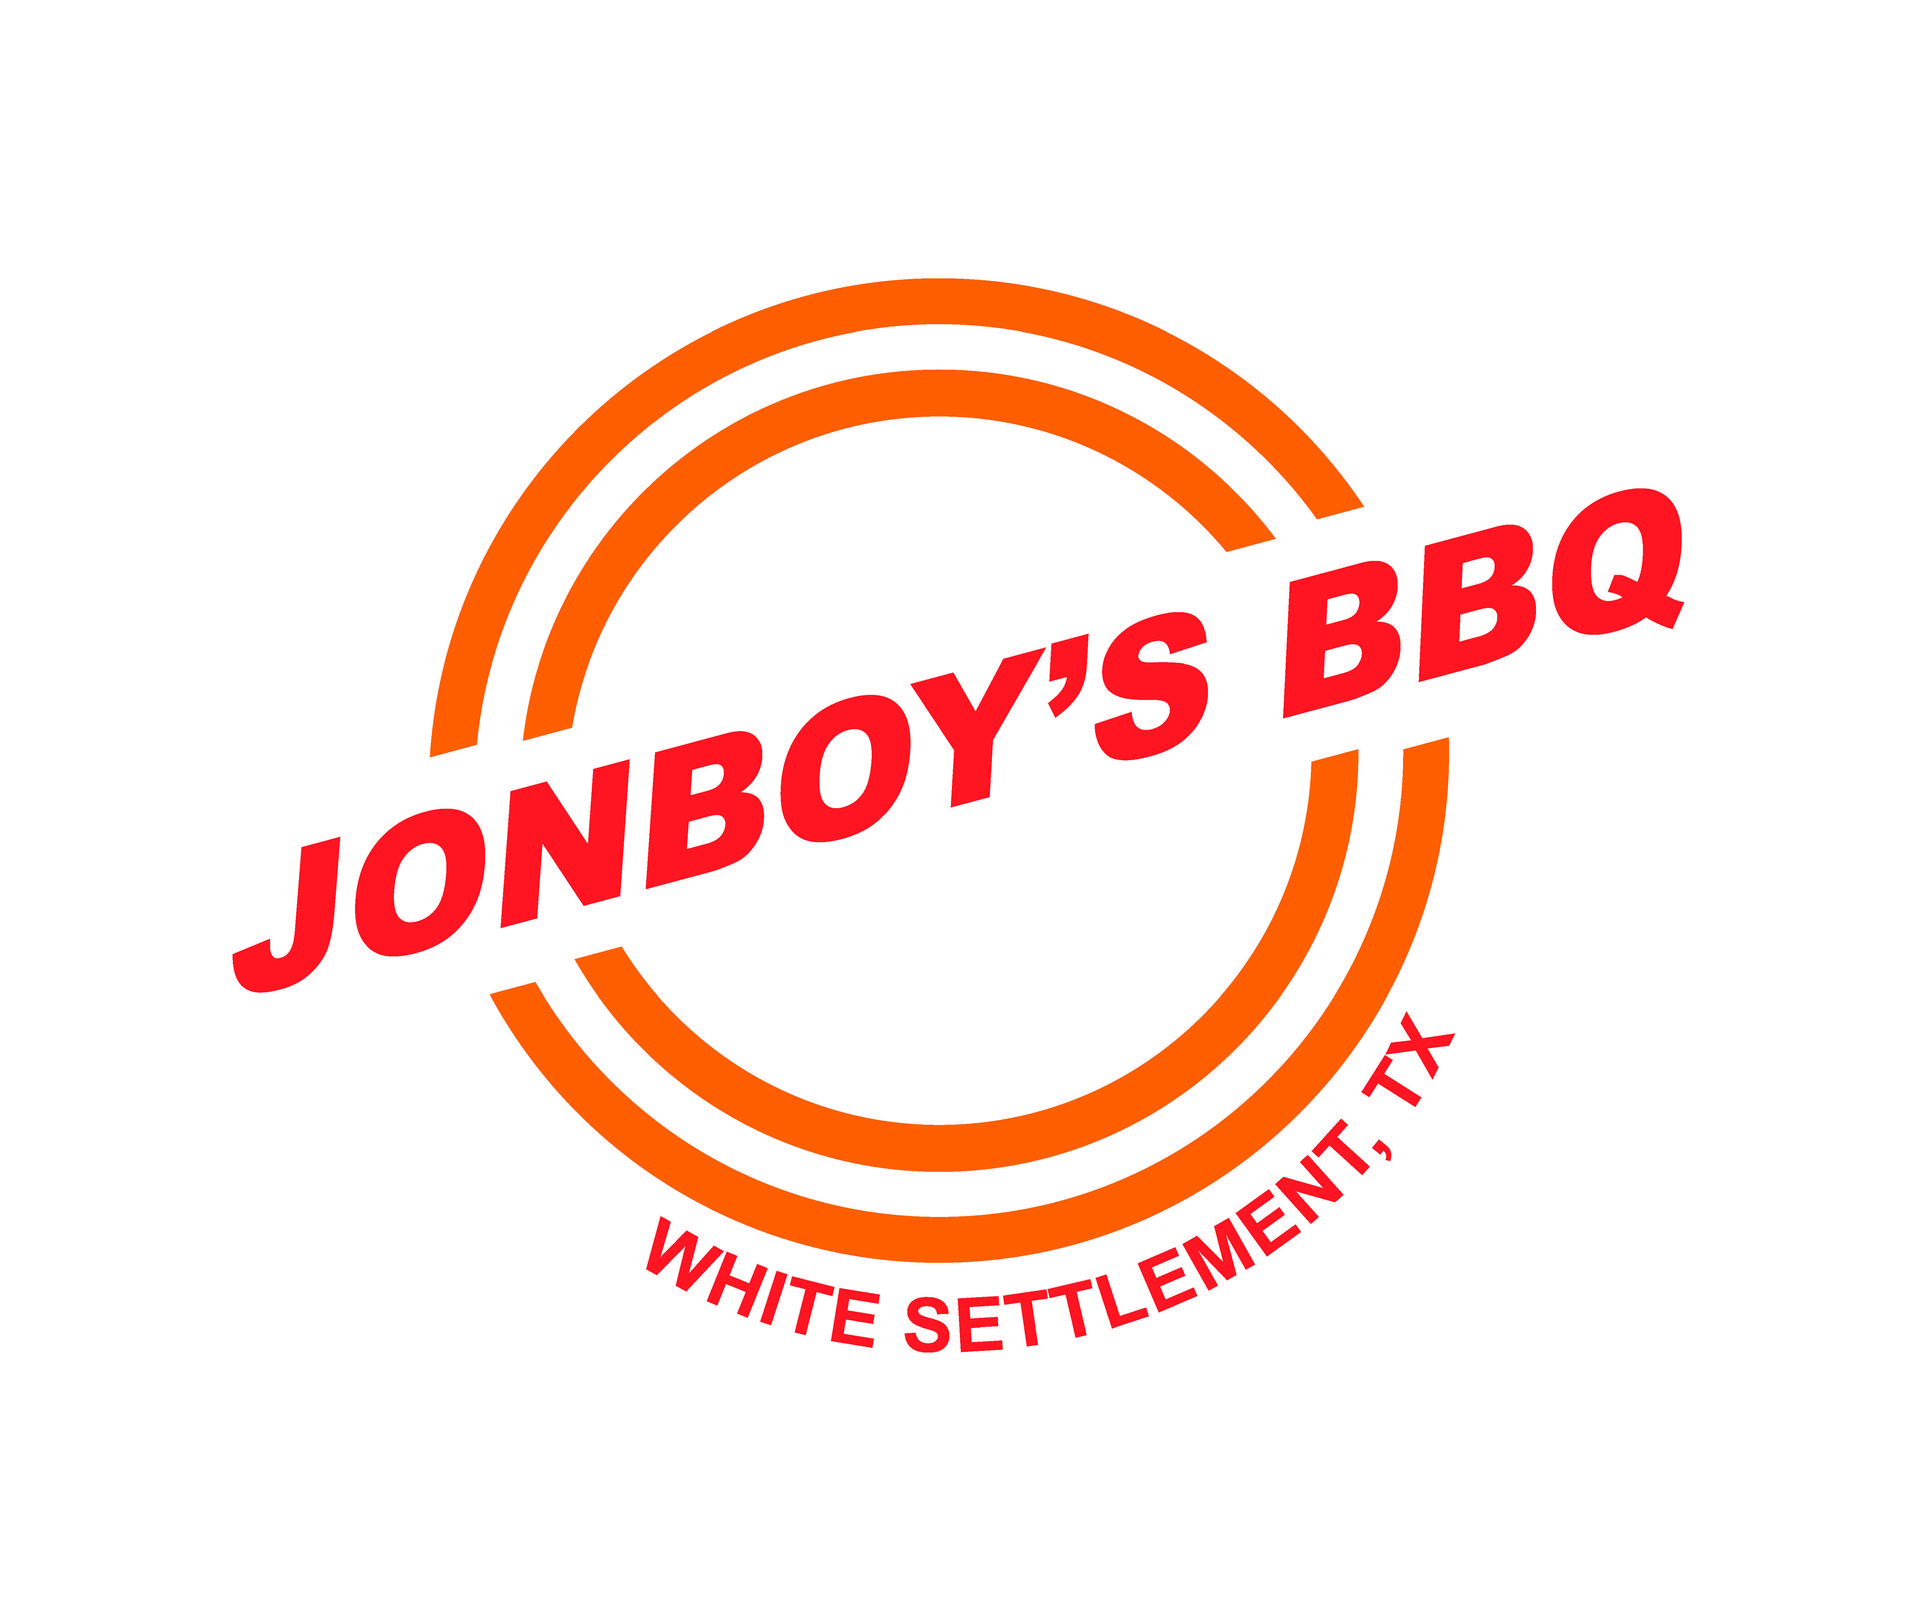 Jonboy's BBQ